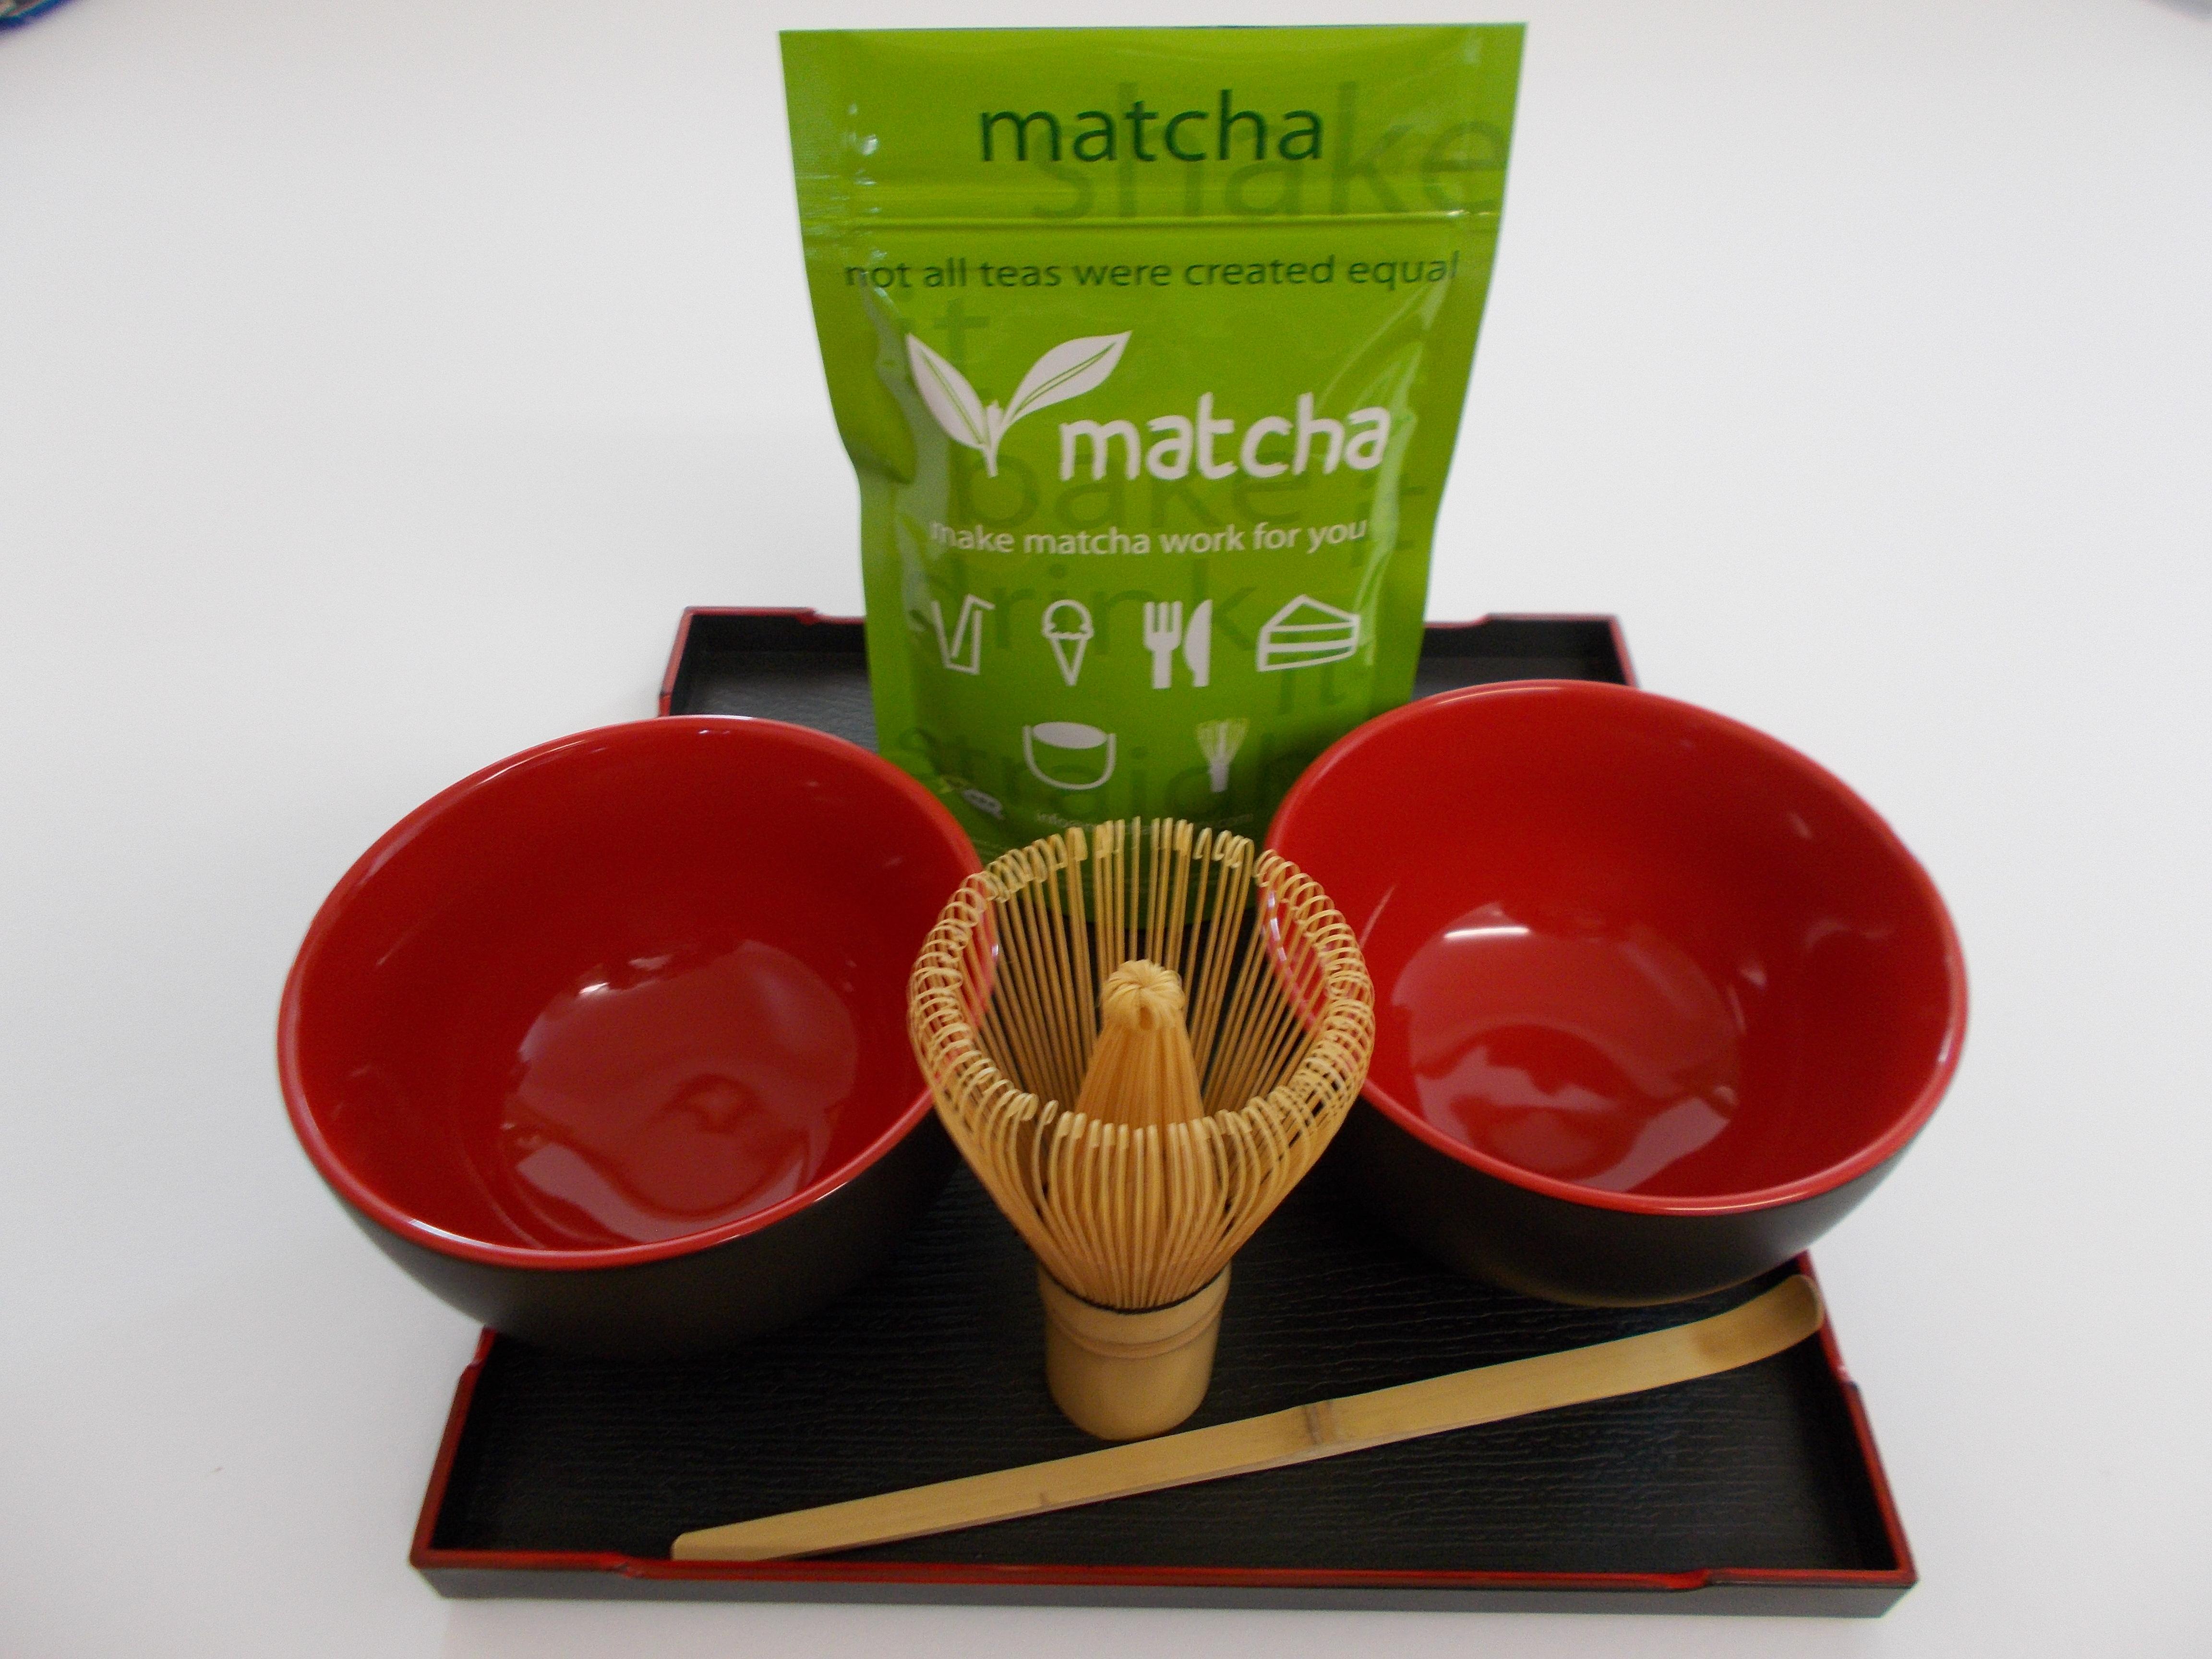 japanische lebensmittel im otsumami land matcha tee set bio gr ntee. Black Bedroom Furniture Sets. Home Design Ideas